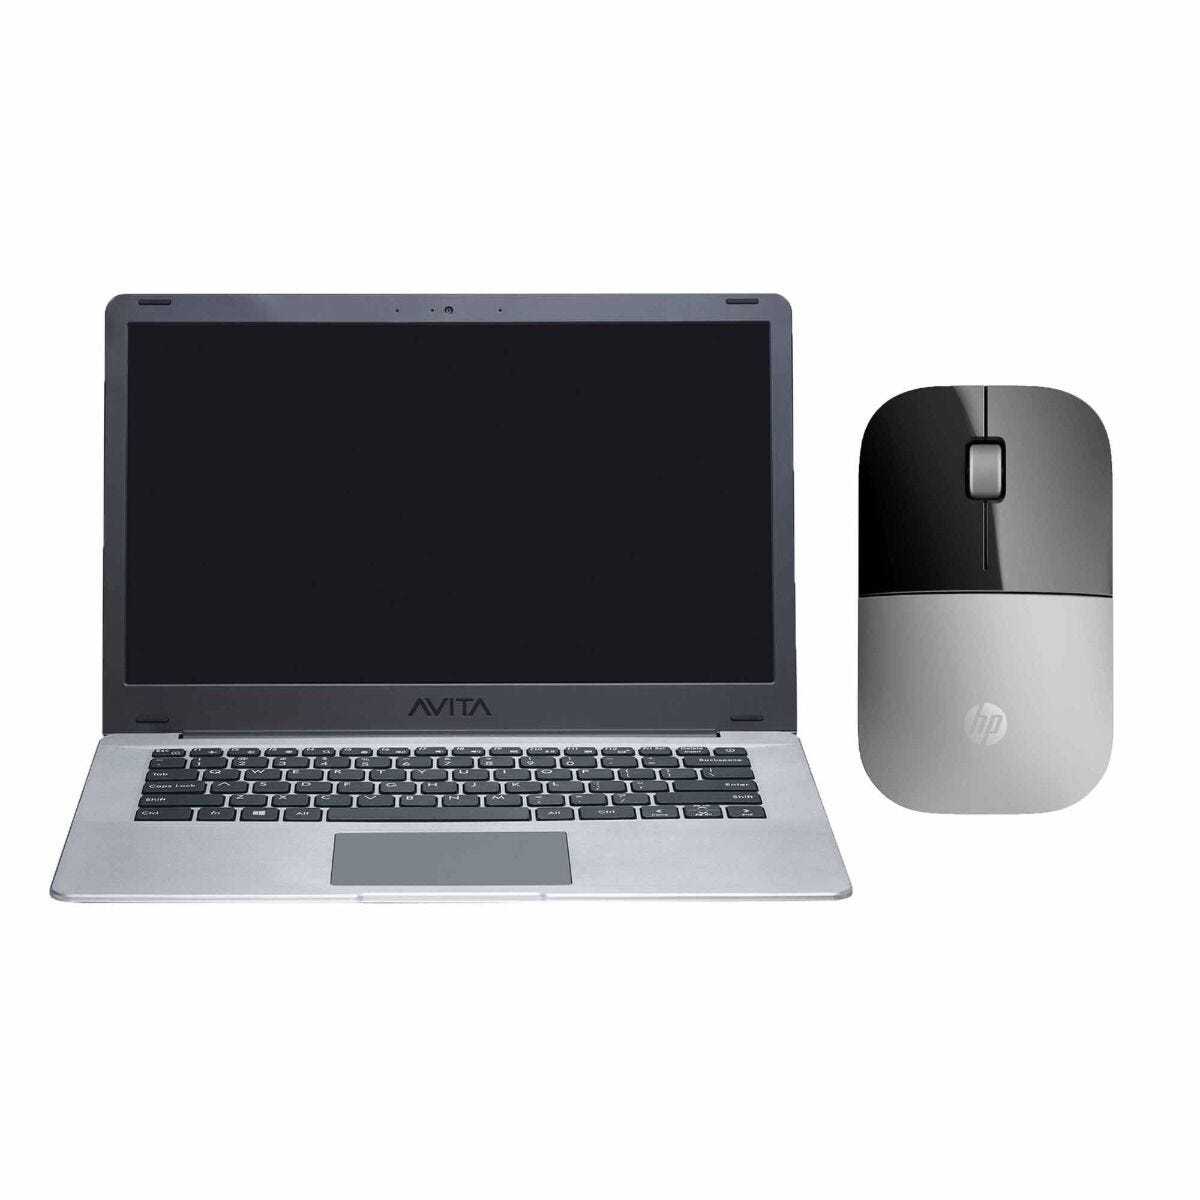 Avita Pura R3 14 Inch Windows 10 with Mouse